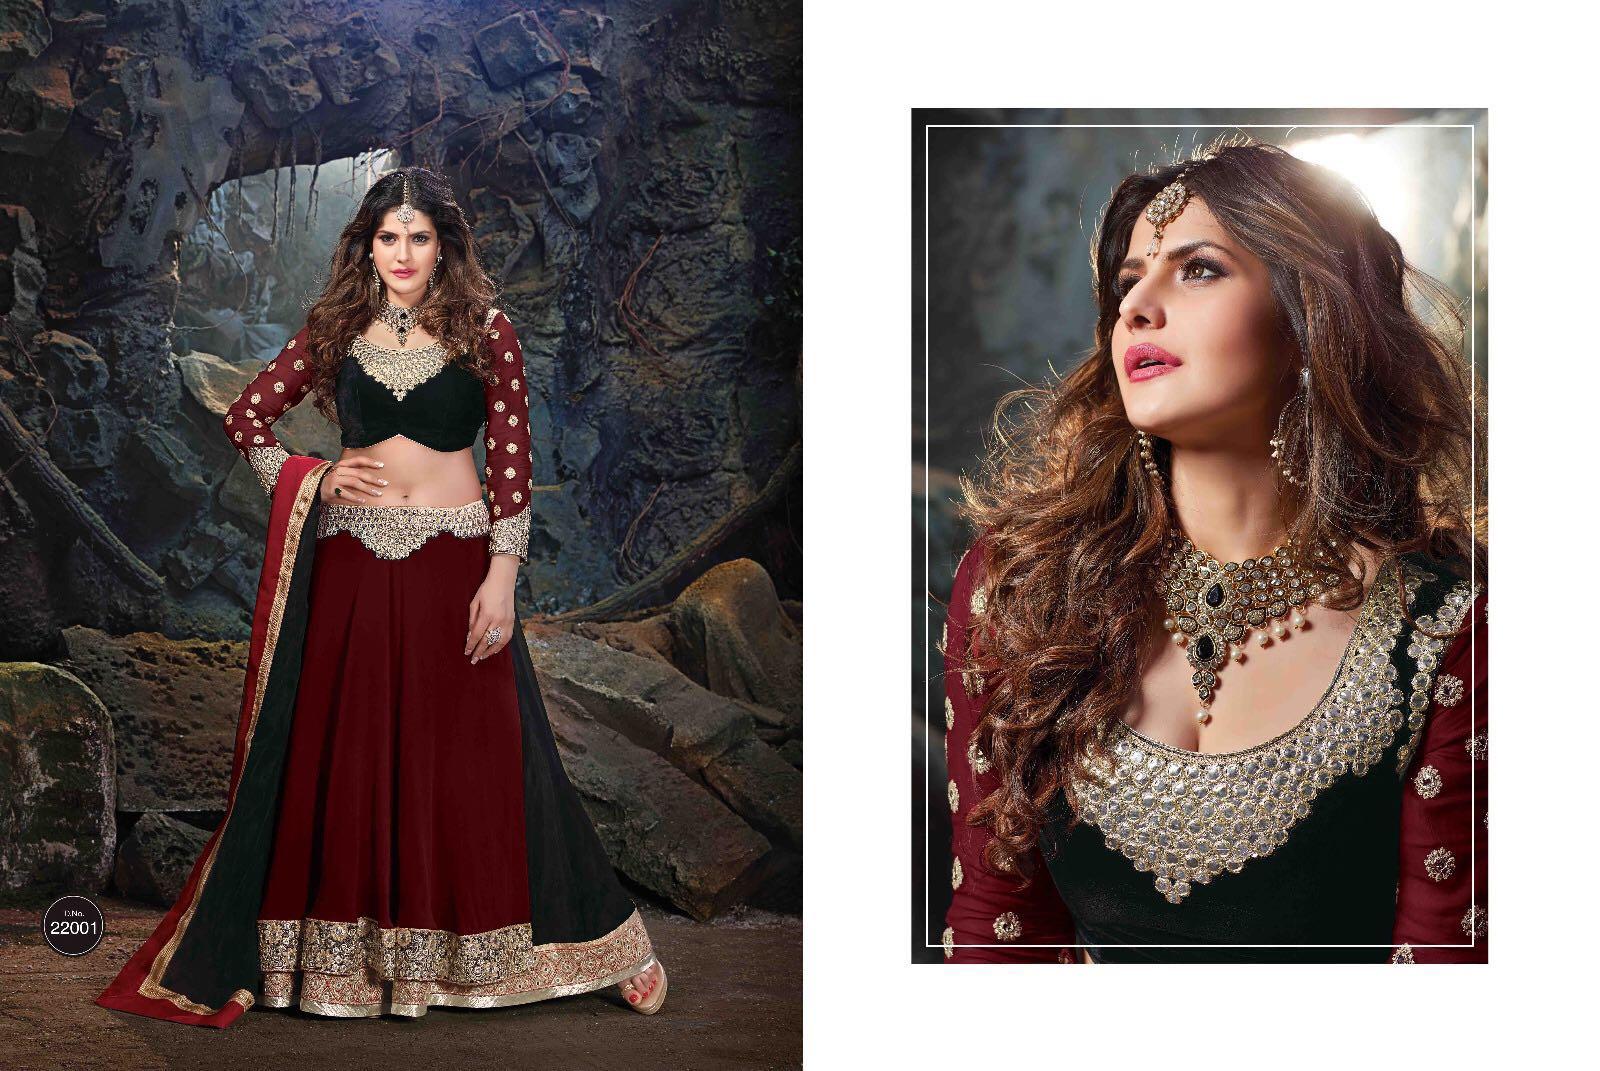 1bdbf4b6c1 Bridal Vol 2 - Zarin Khan Looking Stunning In This Lehenga Choli ...